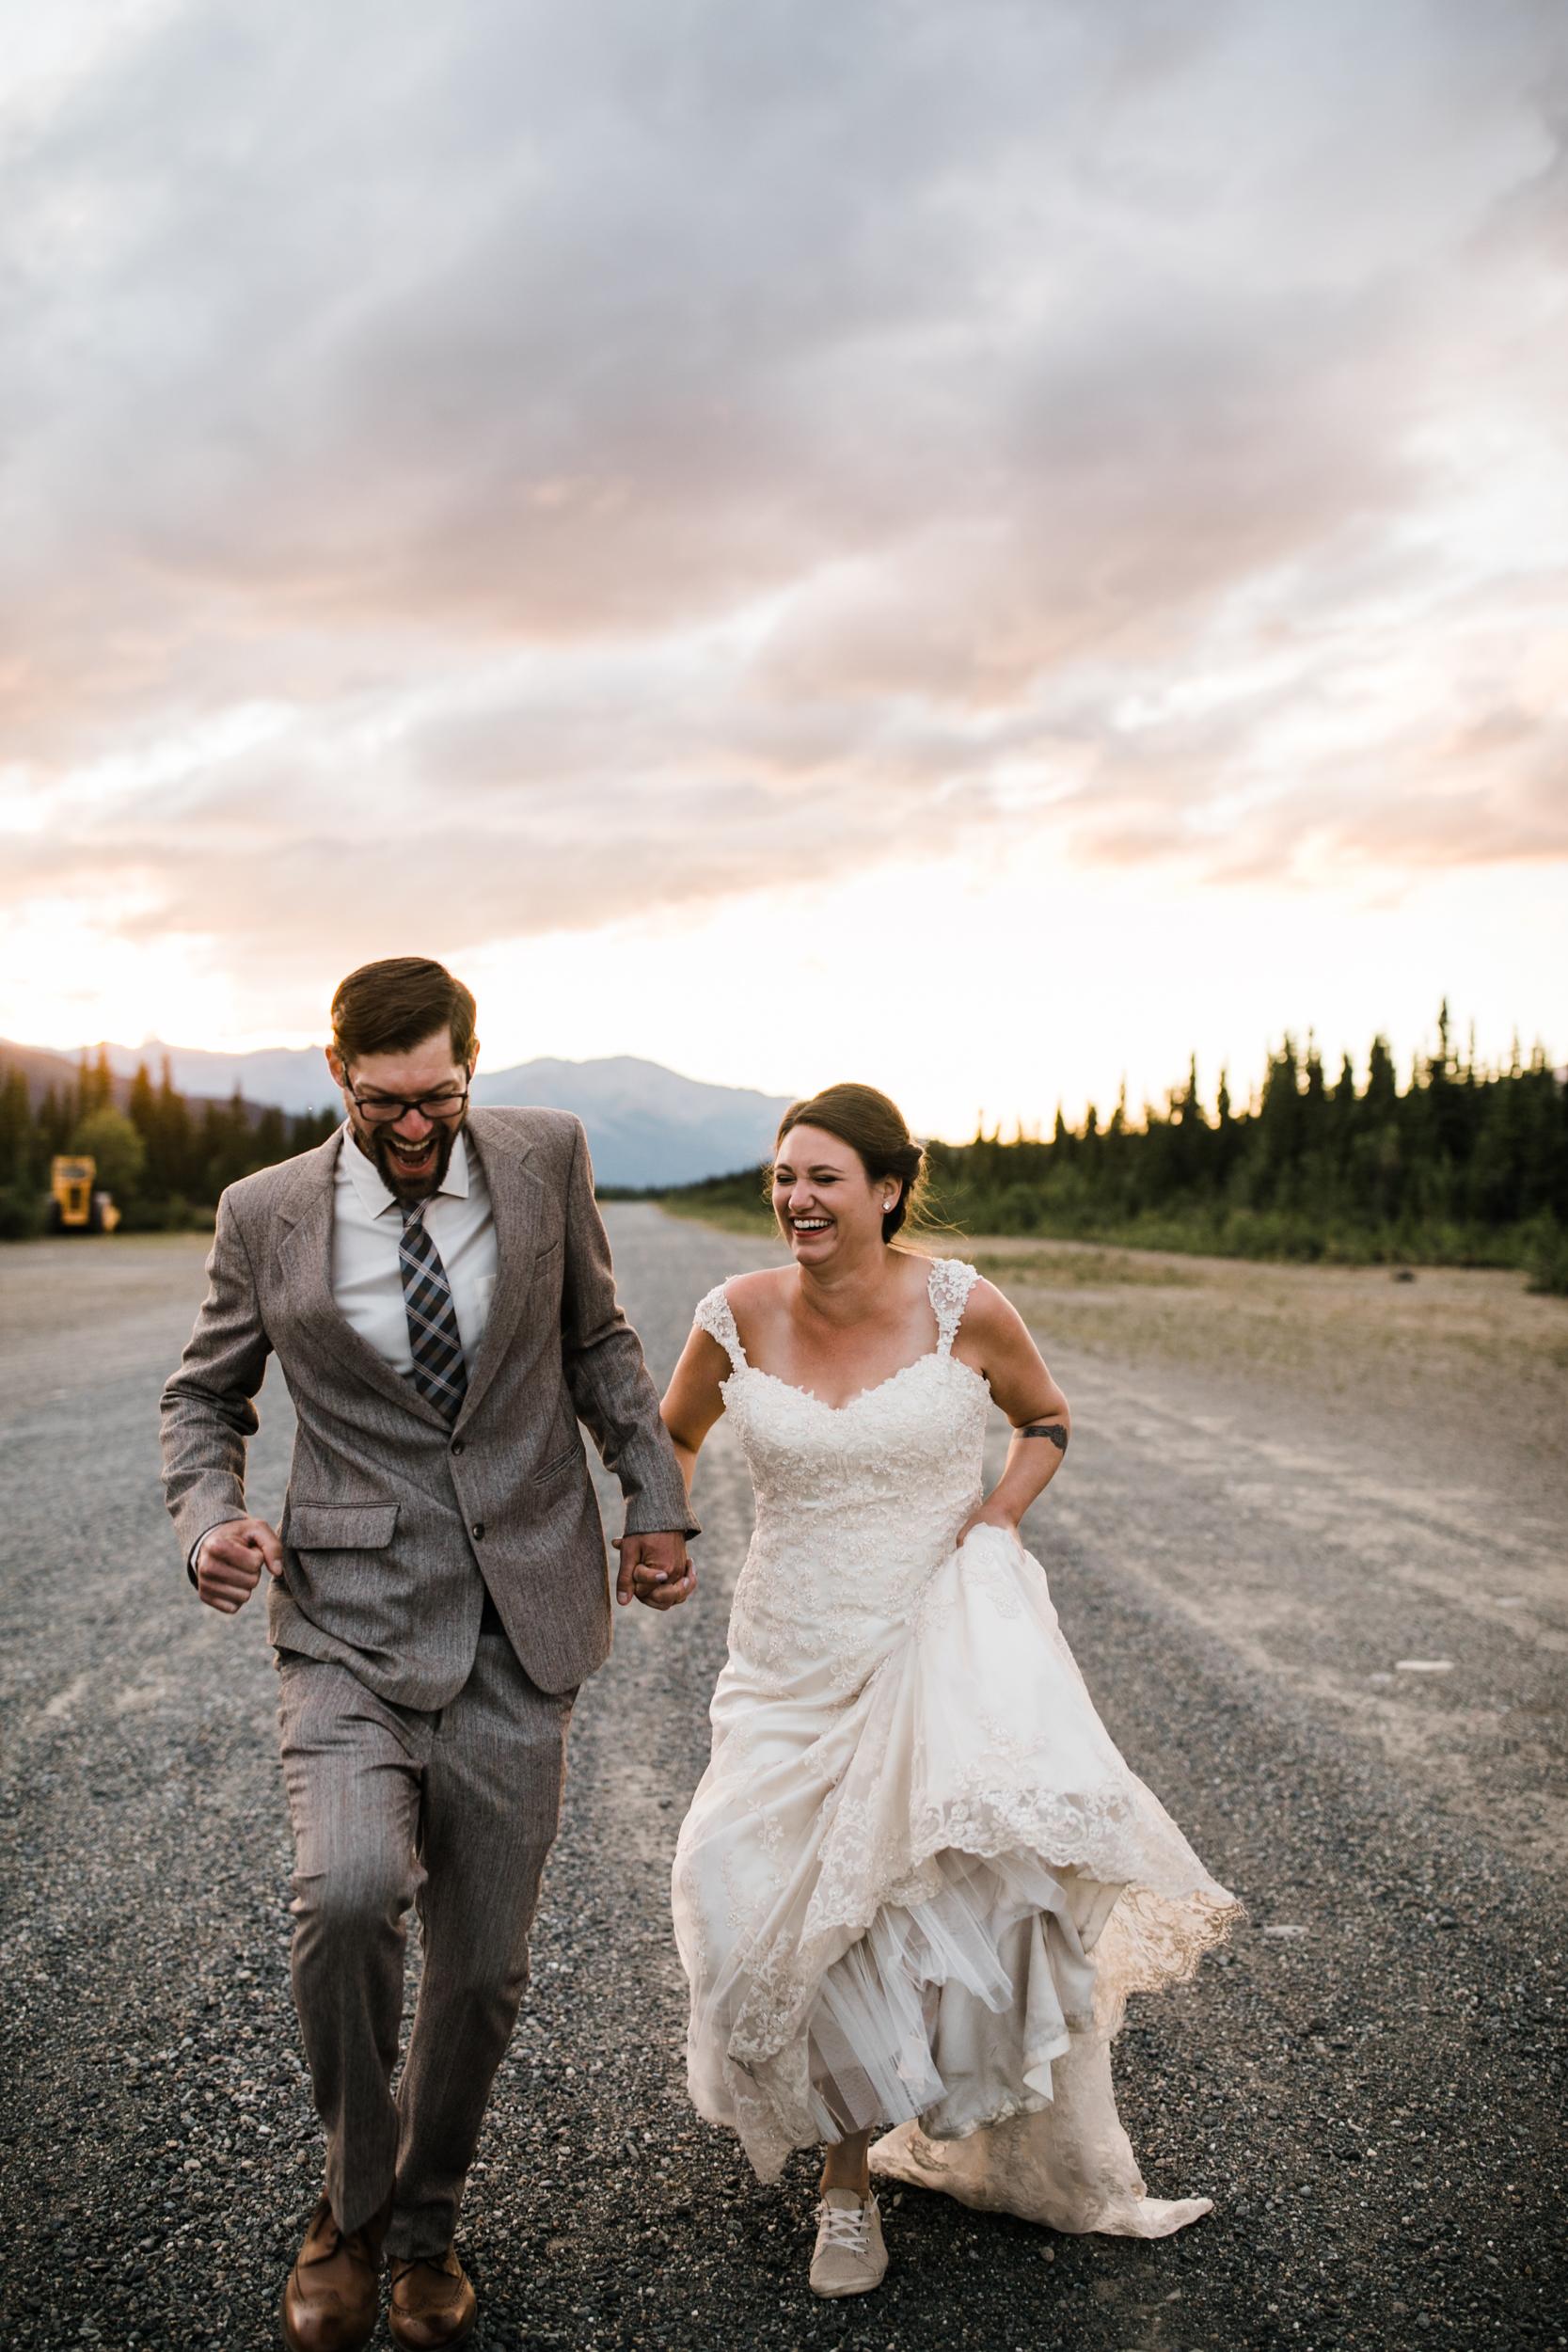 morgan + evan's intimate wedding on the denali airstrip | alaska destination wedding near Denali National Park and Preserve | the hearnes adventure photography